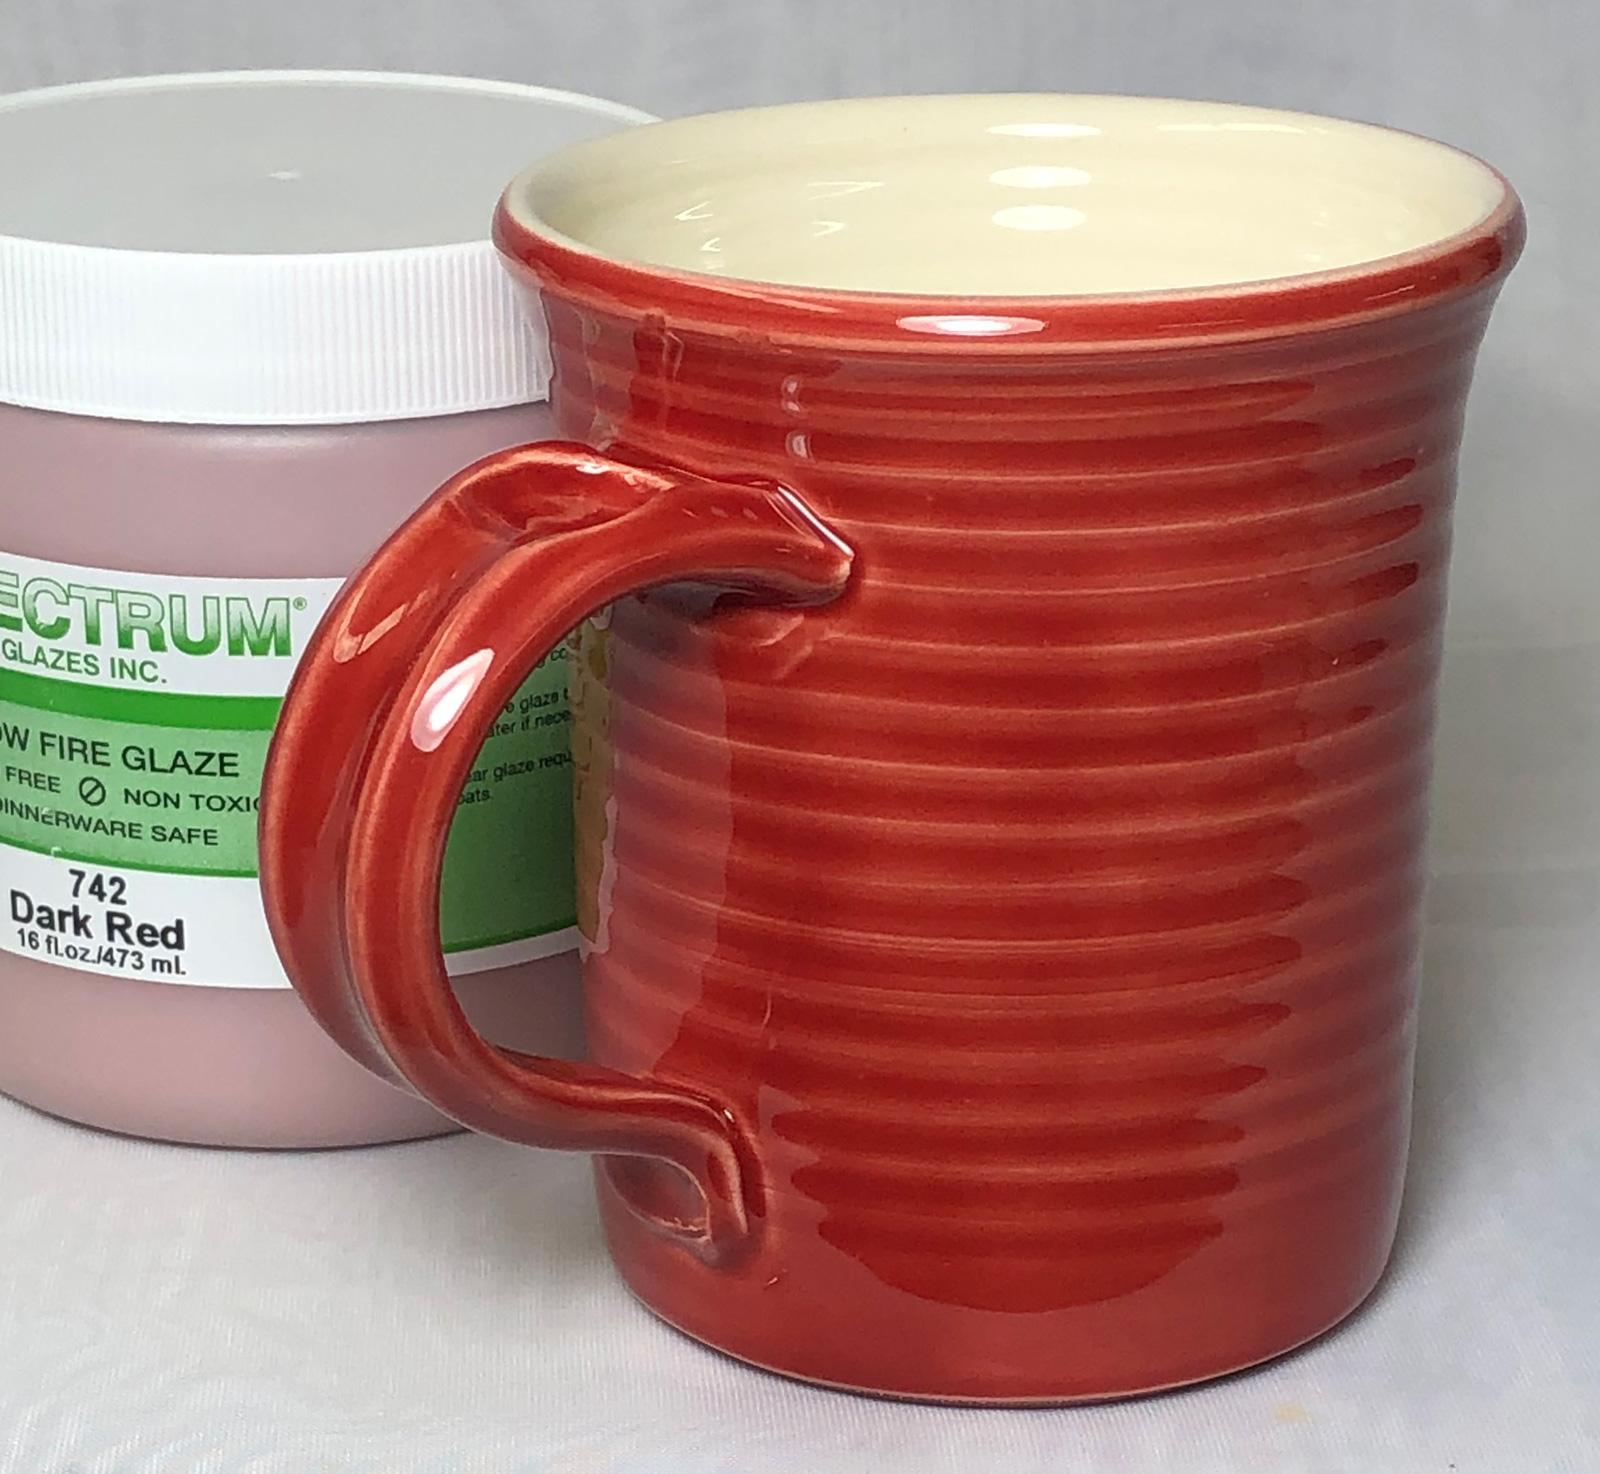 A red glossy earthenware mug